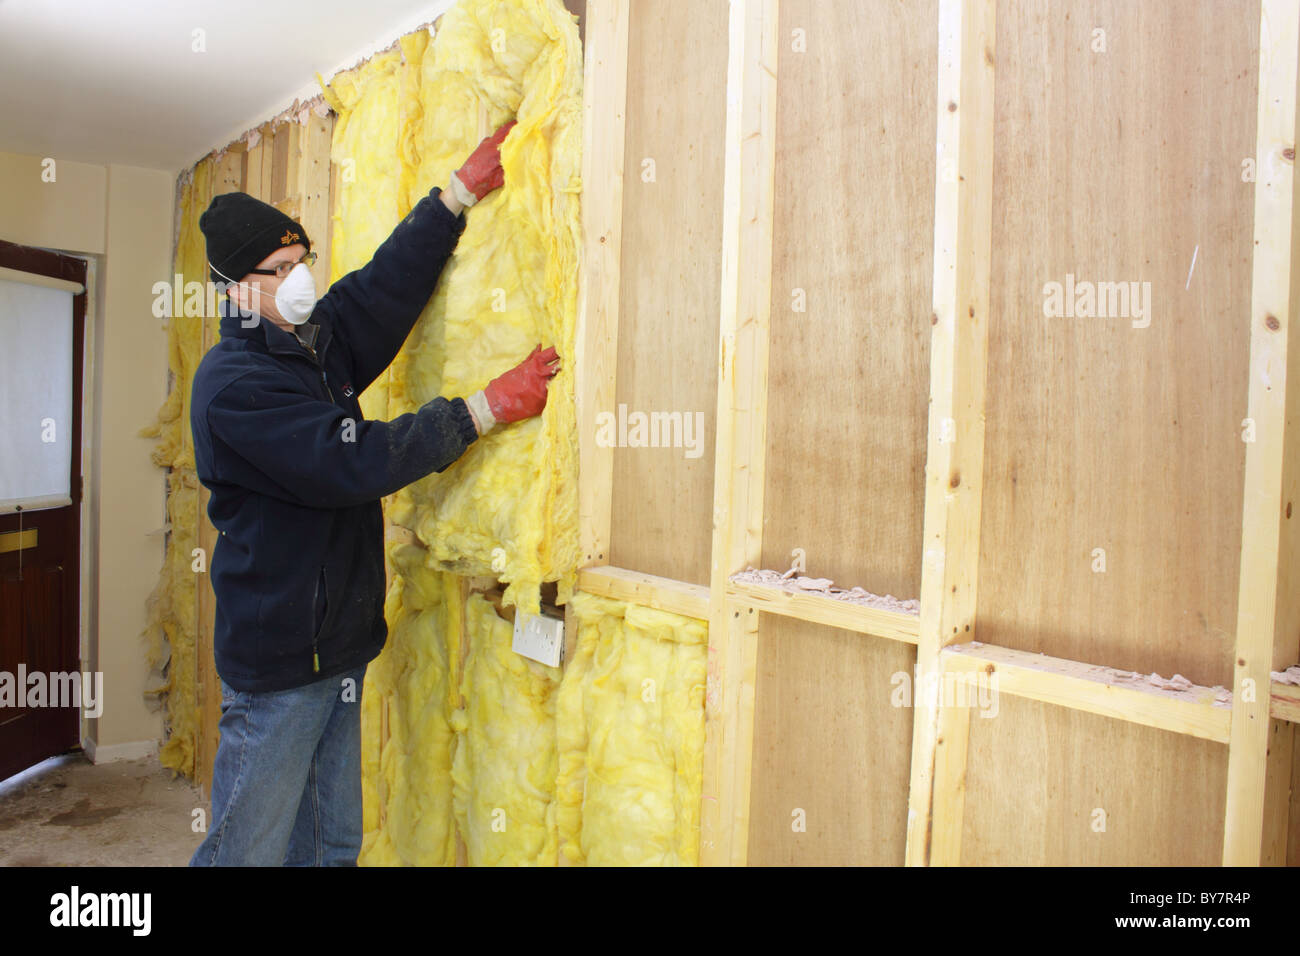 Cavity Wall Insulation Stock Photos & Cavity Wall Insulation Stock ...